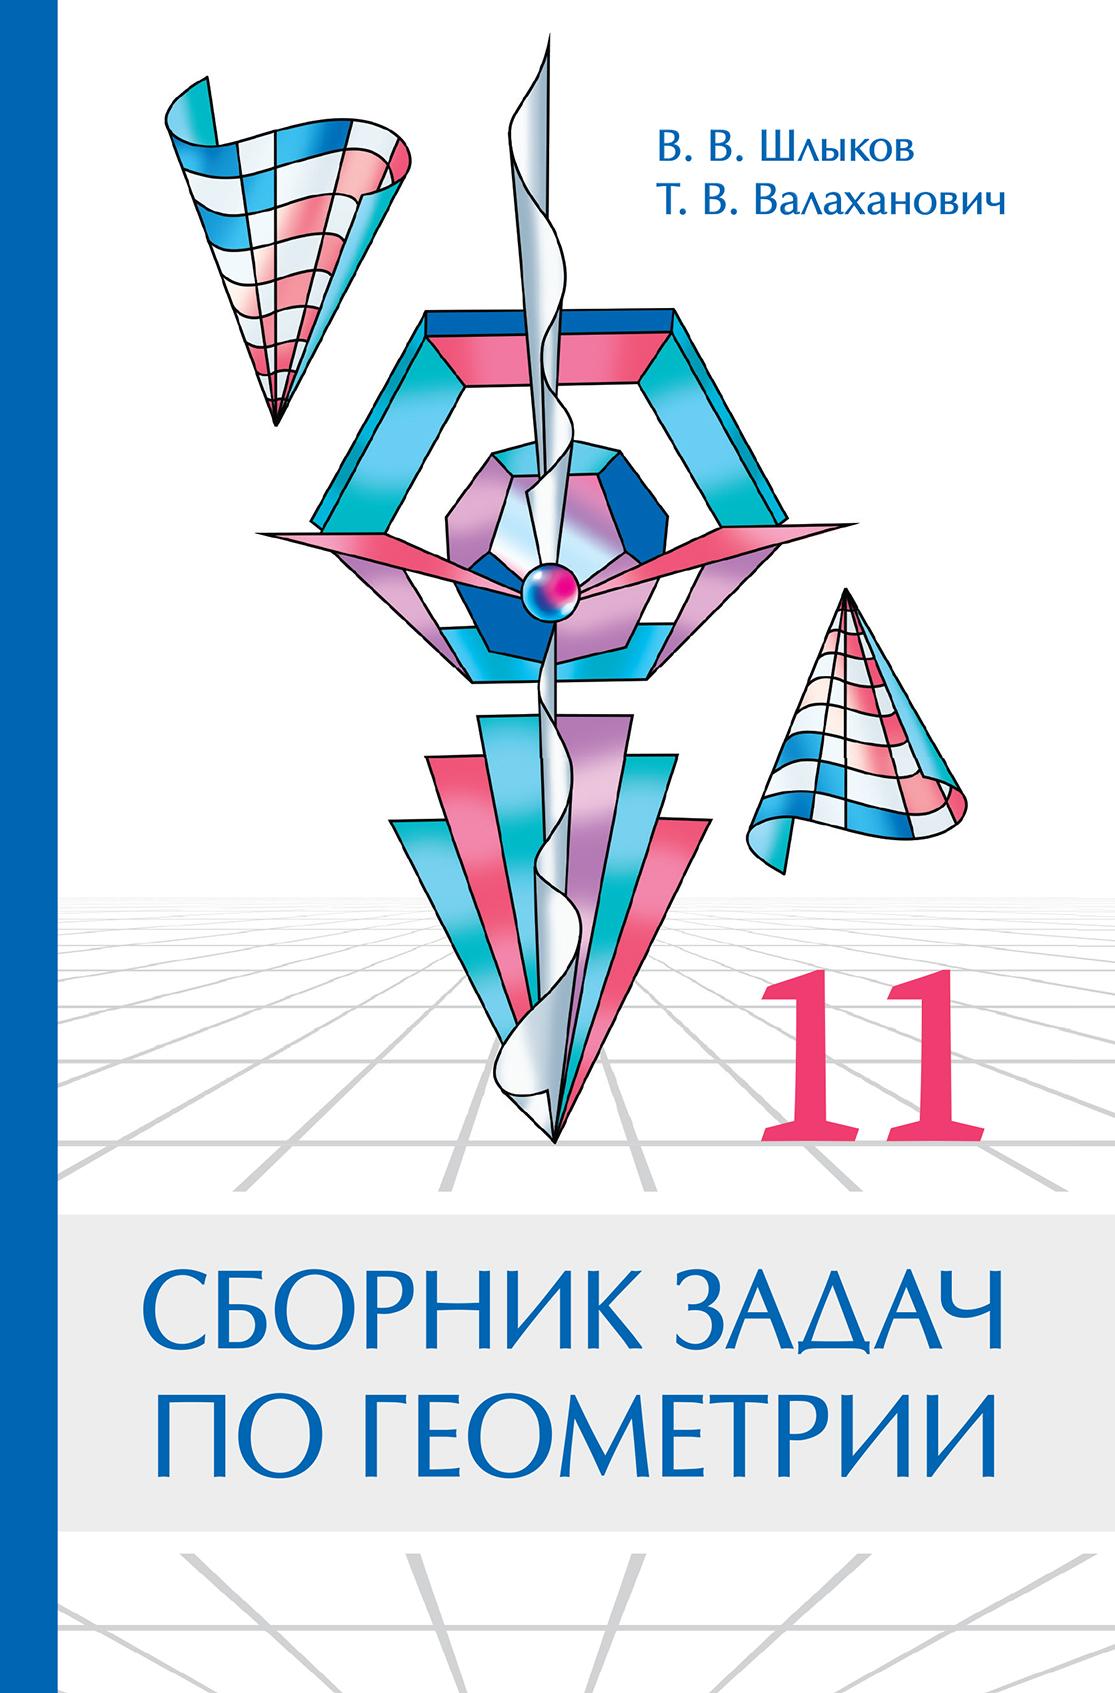 Сборник задач по геометрии, 11 класс